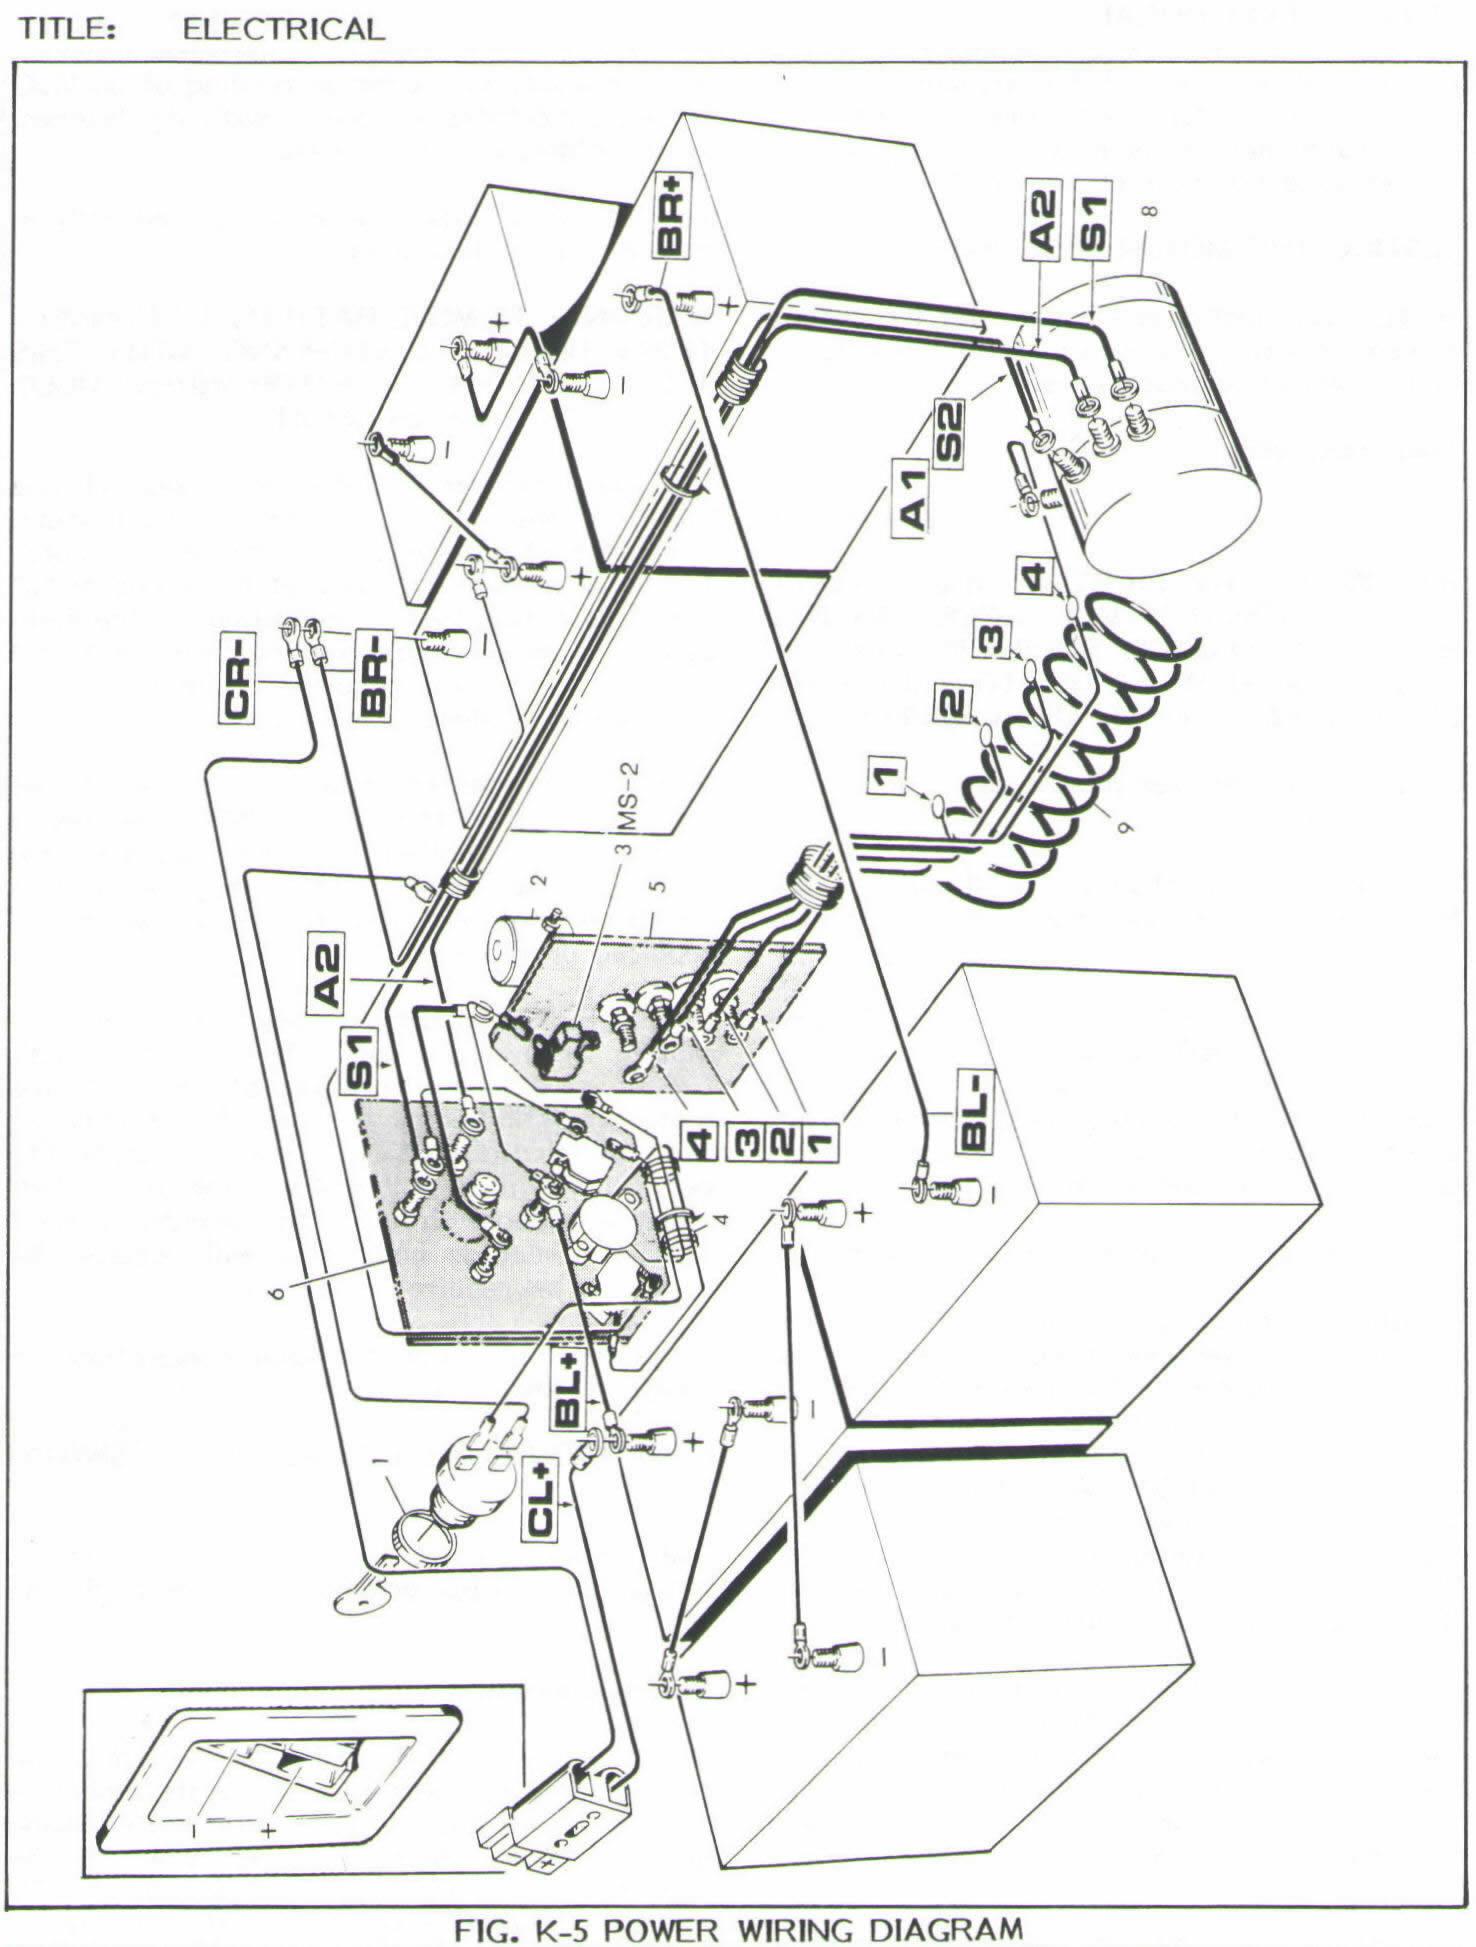 5 Ezgo Medalist Electric Golf Cart Wiring Diagram